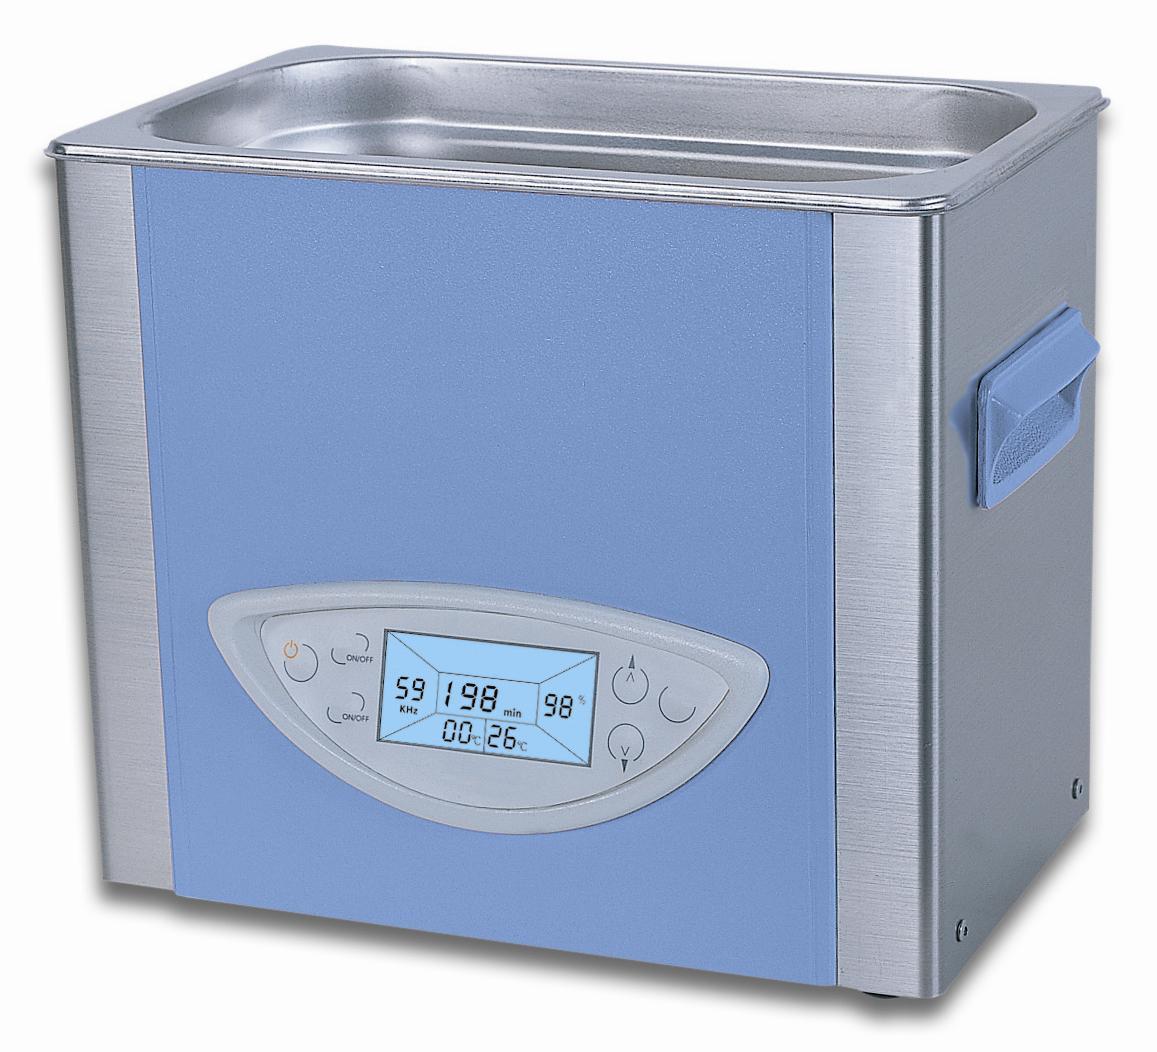 Ba o ultrasonido lbs2 15 l con calefacci n herascientific for Bano ultrasonidos laboratorio